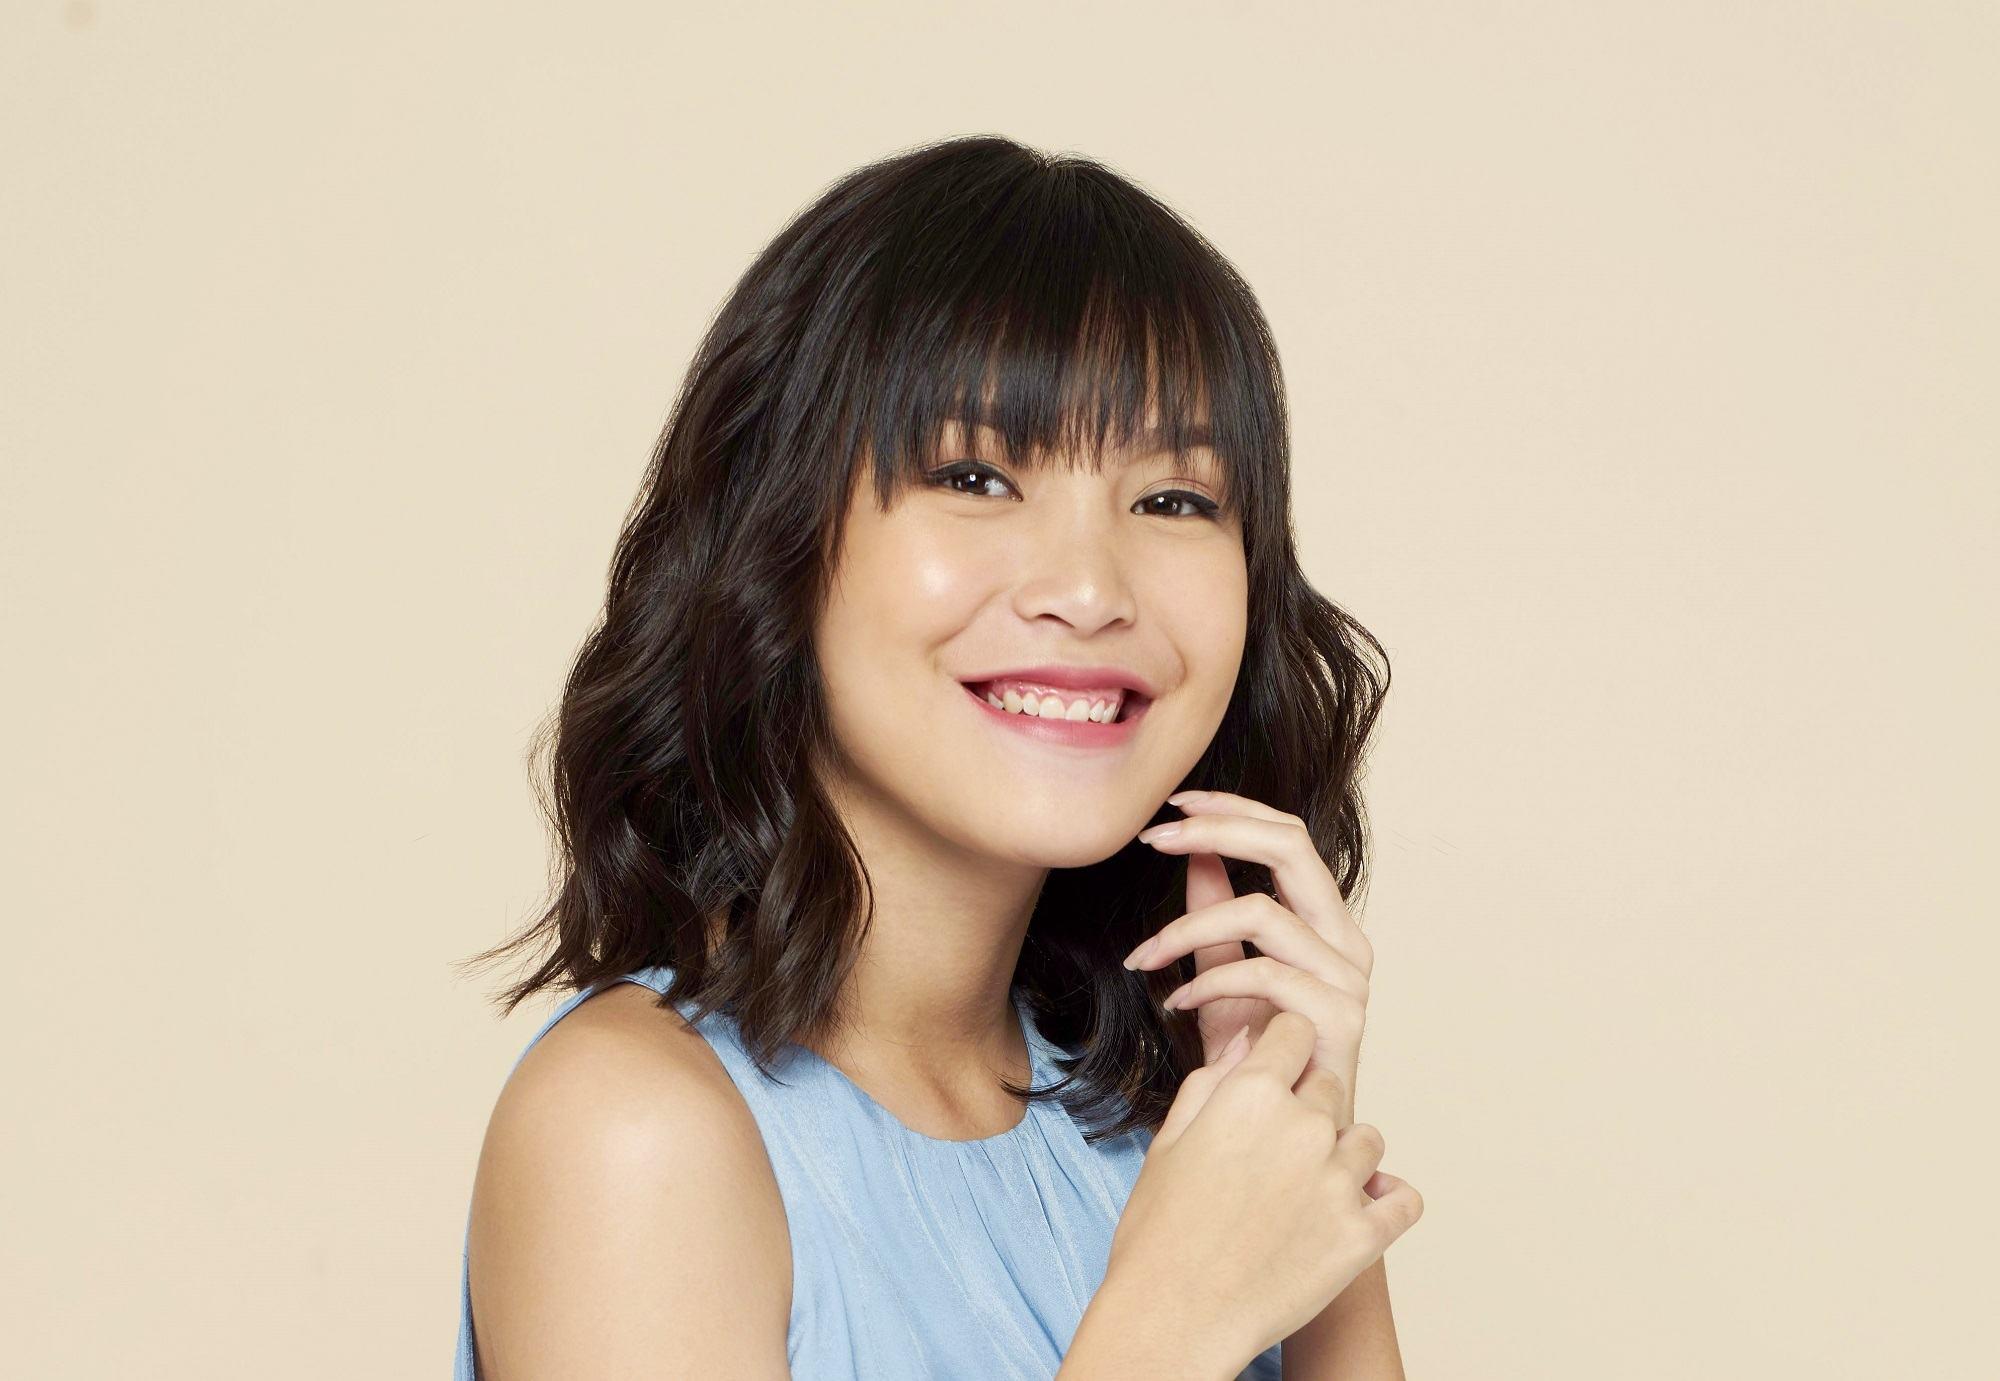 Shoulder length haircuts: Closeup shot of an Asian woman with dark shoulder length hair with bangs